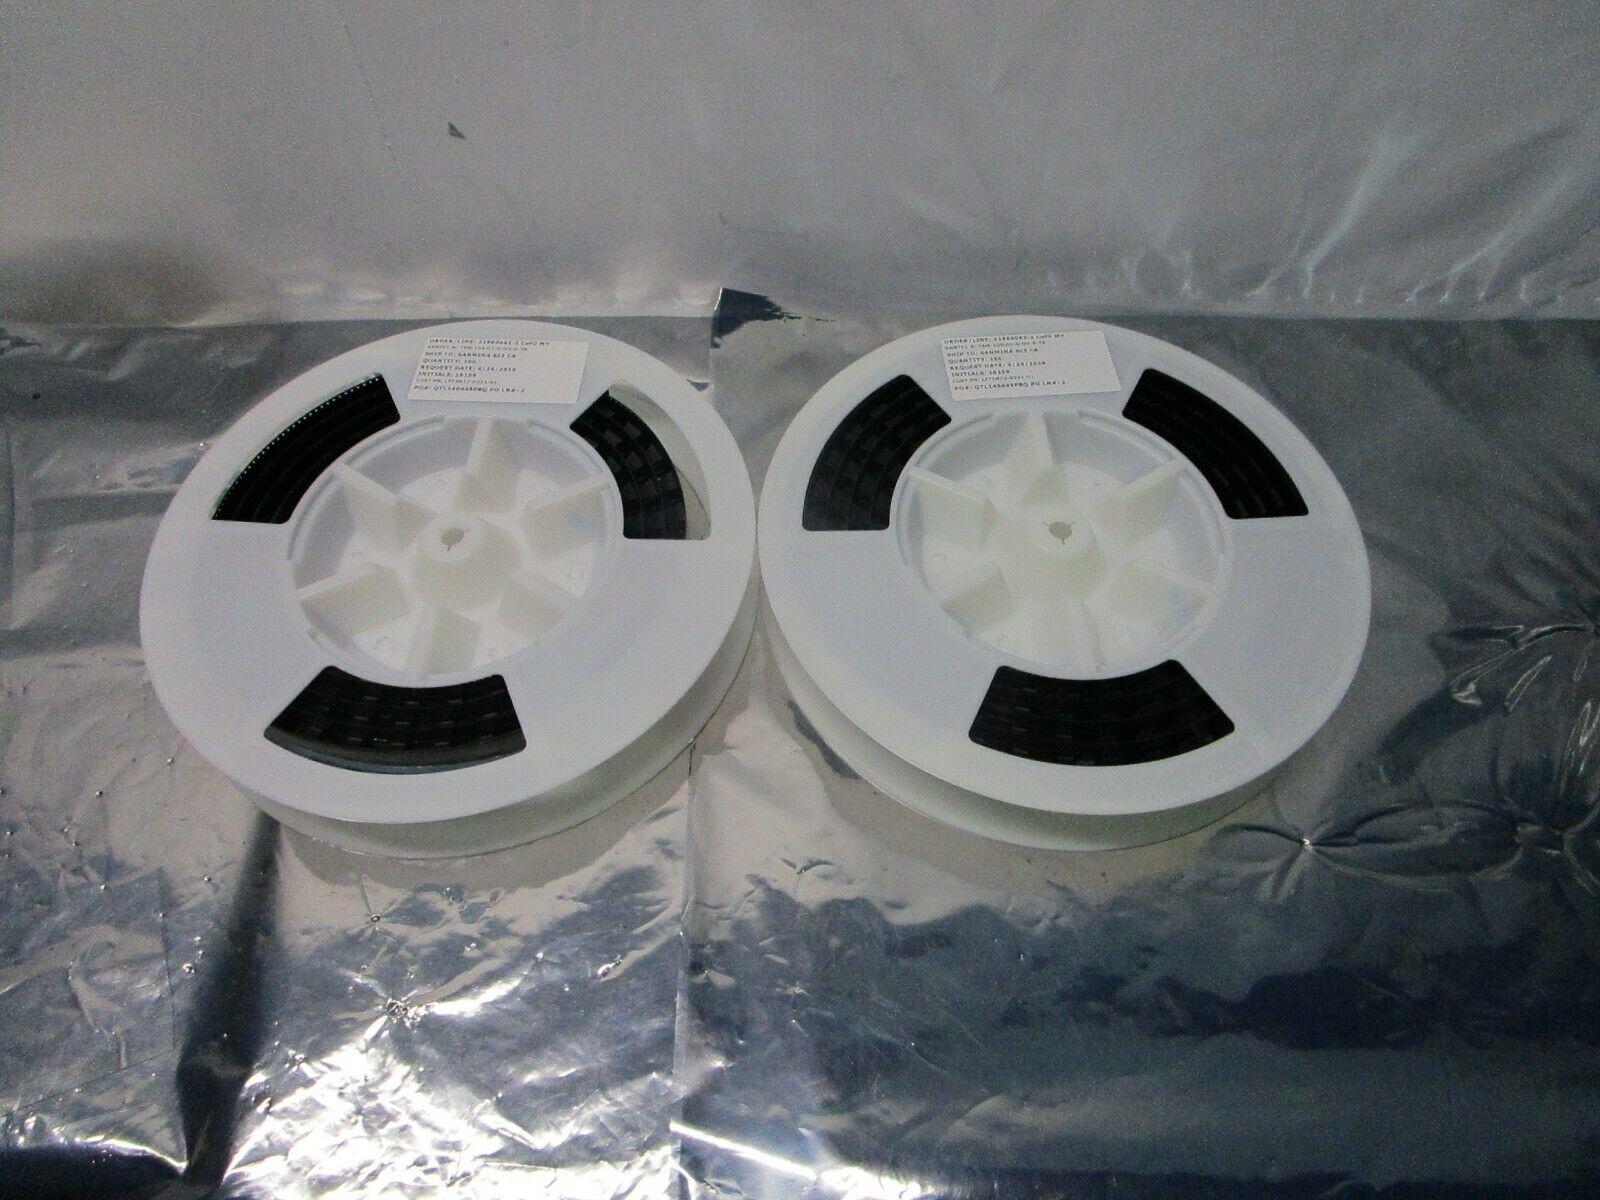 1 Lot of 250 SAMTEC TSM-105-01-G-DV-P-TR, 102317